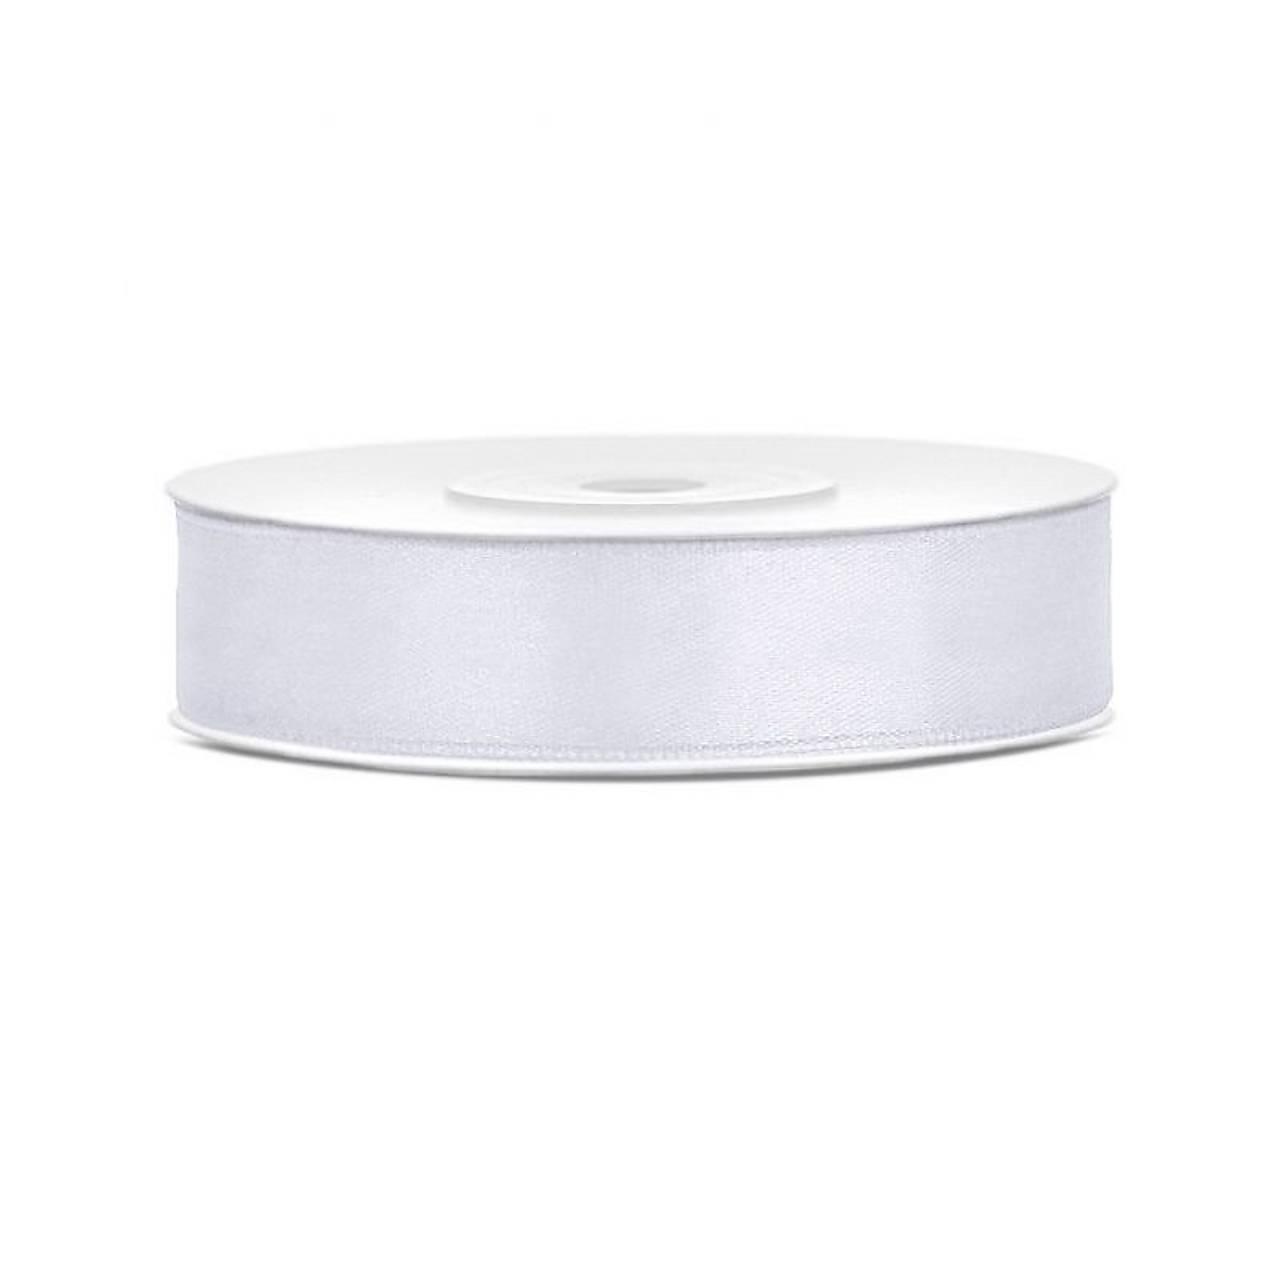 saténová stuha 25 mm biela - Obrázok č. 1